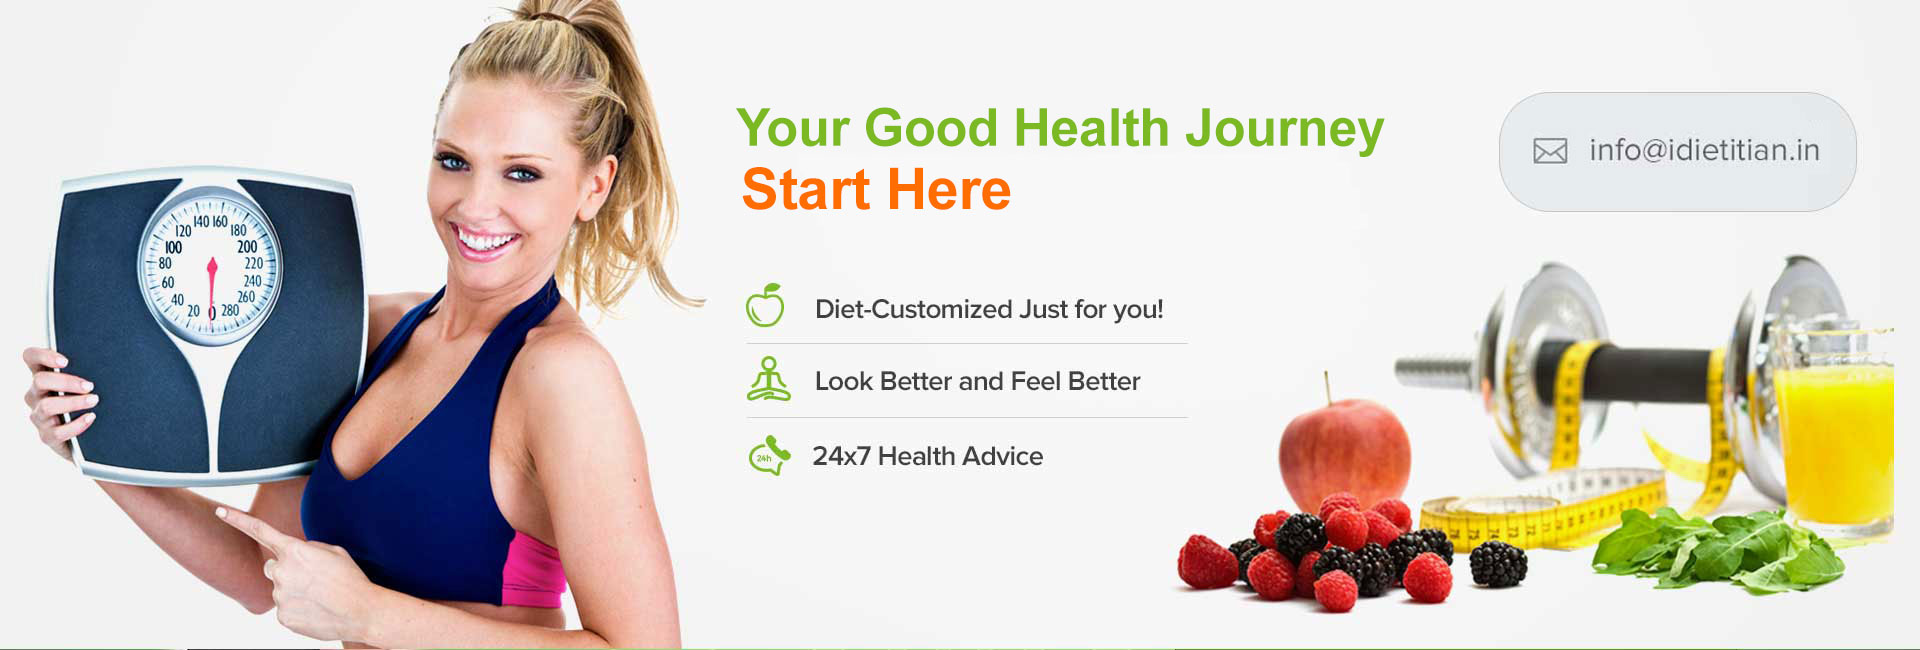 Online Special Weight Loss Program Weight Loss Diet Plan Idietitian